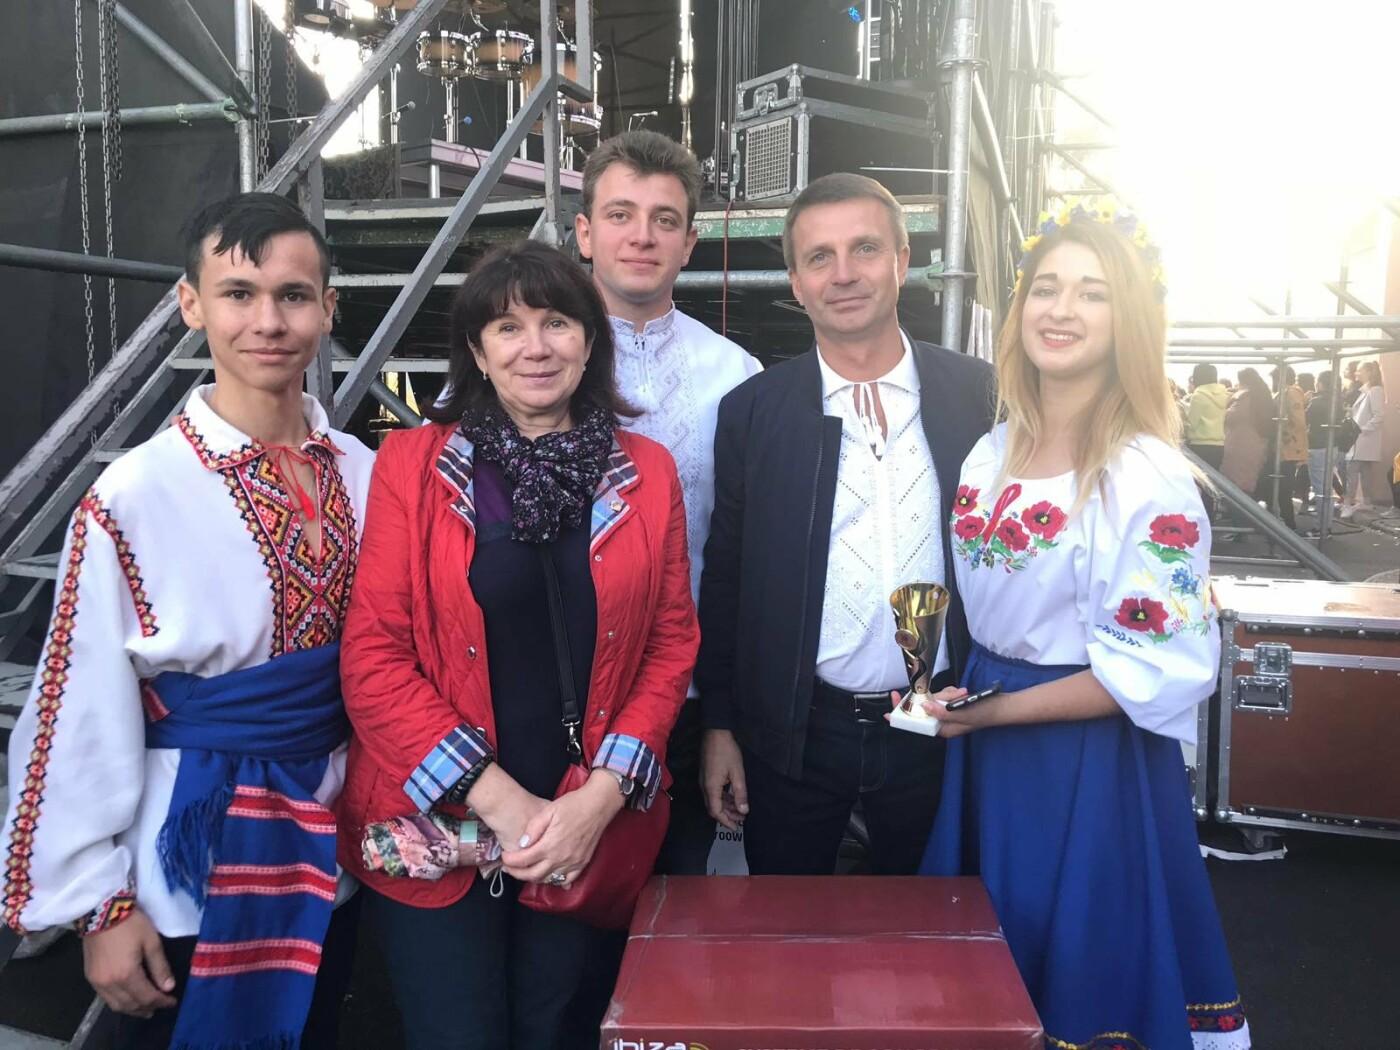 Каменчане заняли первое место на фестивале «Петриковский дивоцвит-2019», фото-1